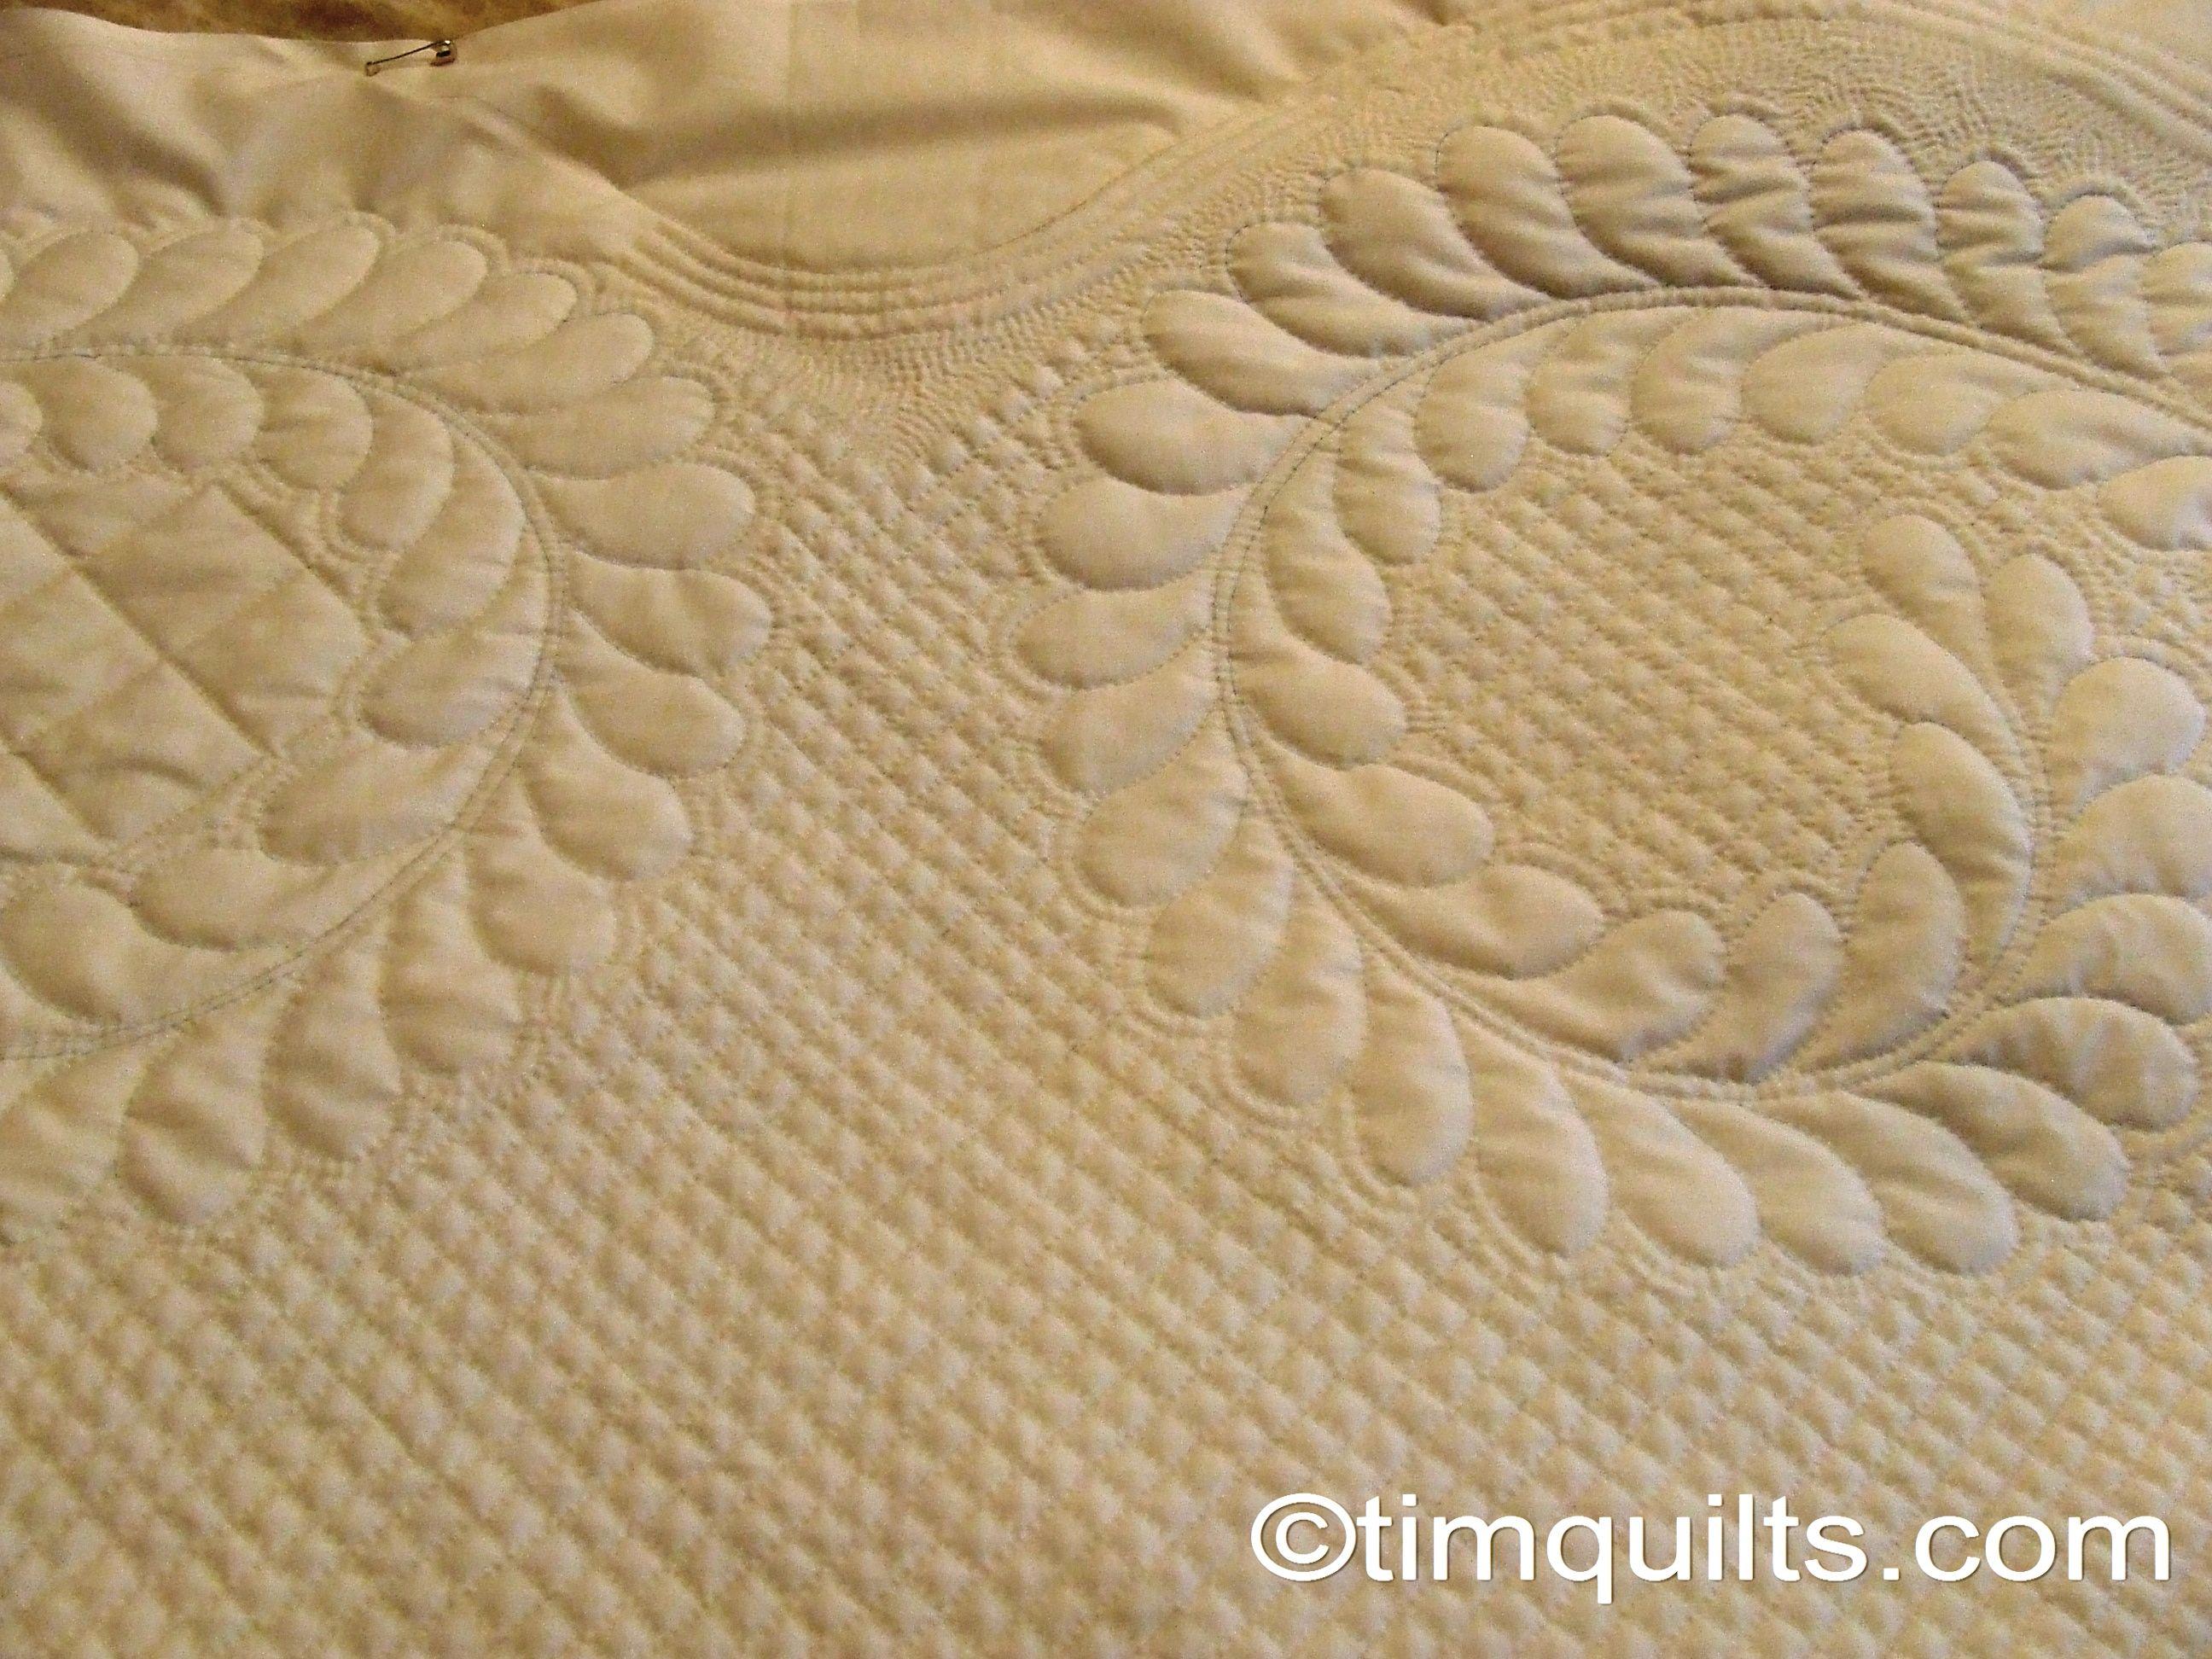 hand quilting patterns - Google Search | Трапунто | Pinterest